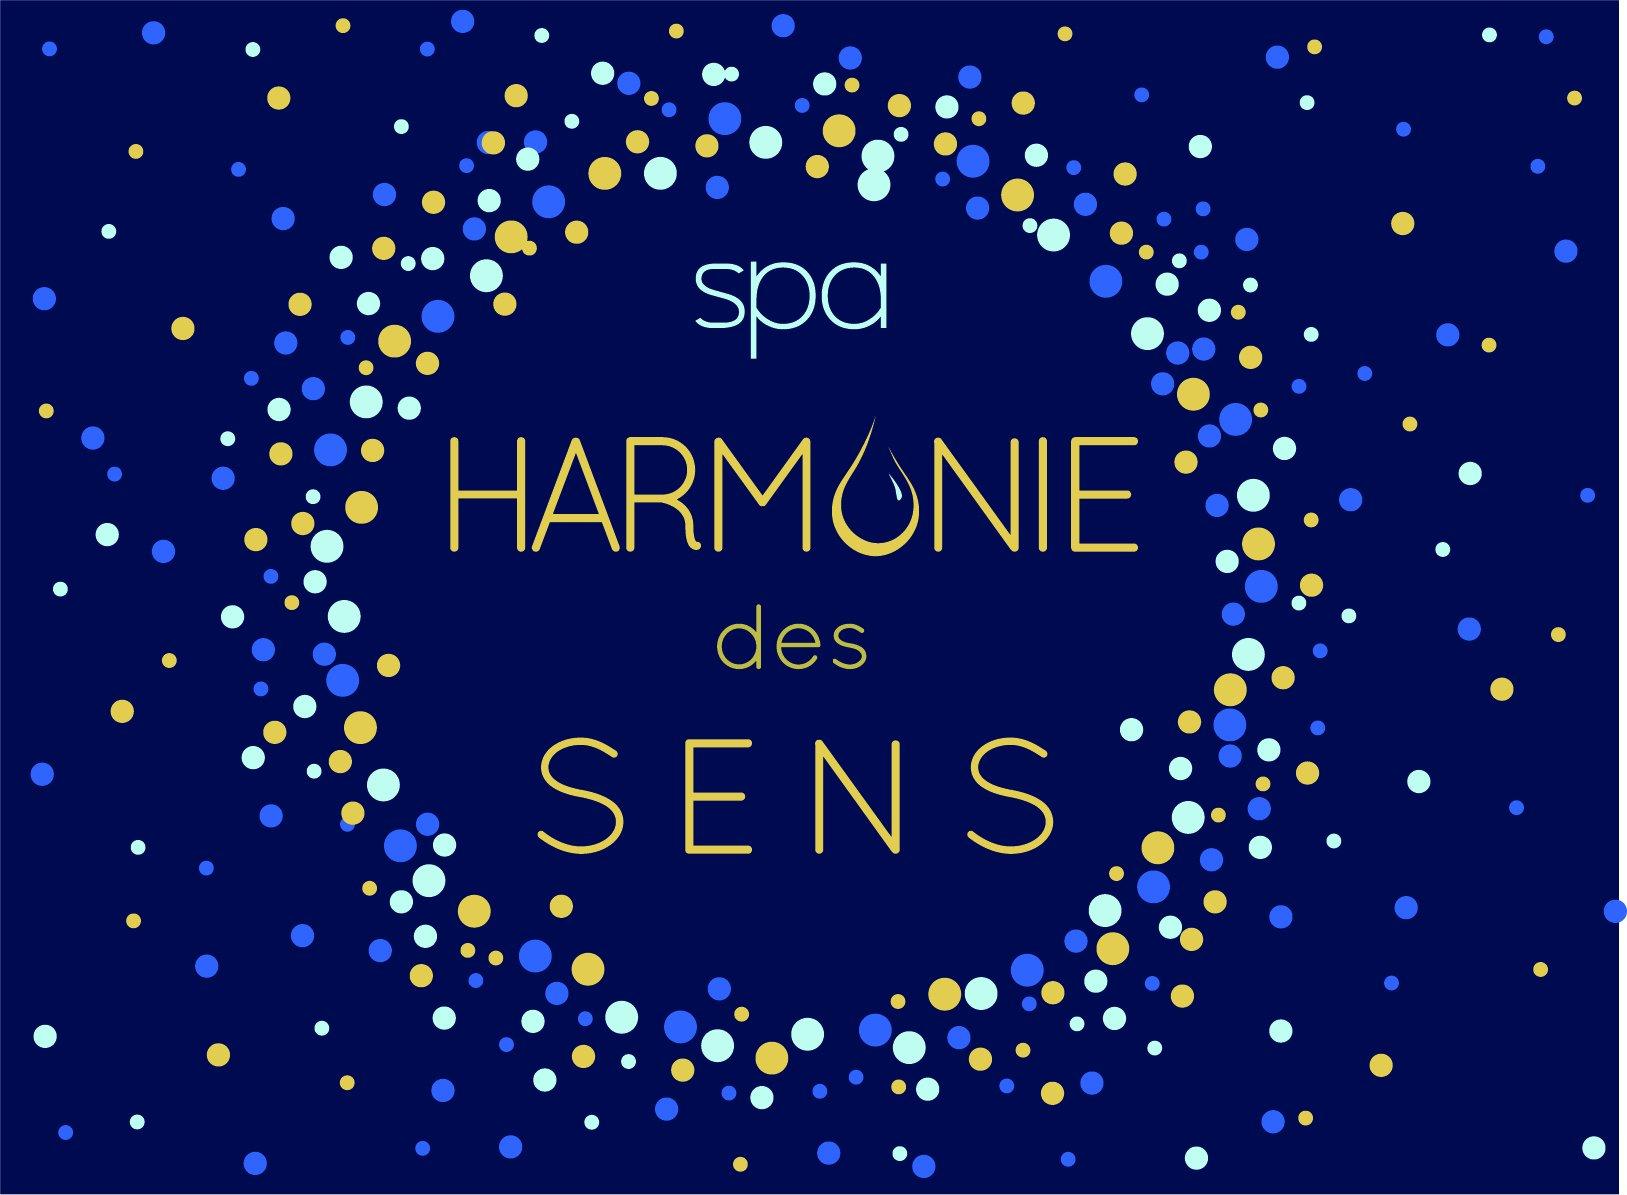 1518-troyes-10-spa-harmonie-des-sens.jpg